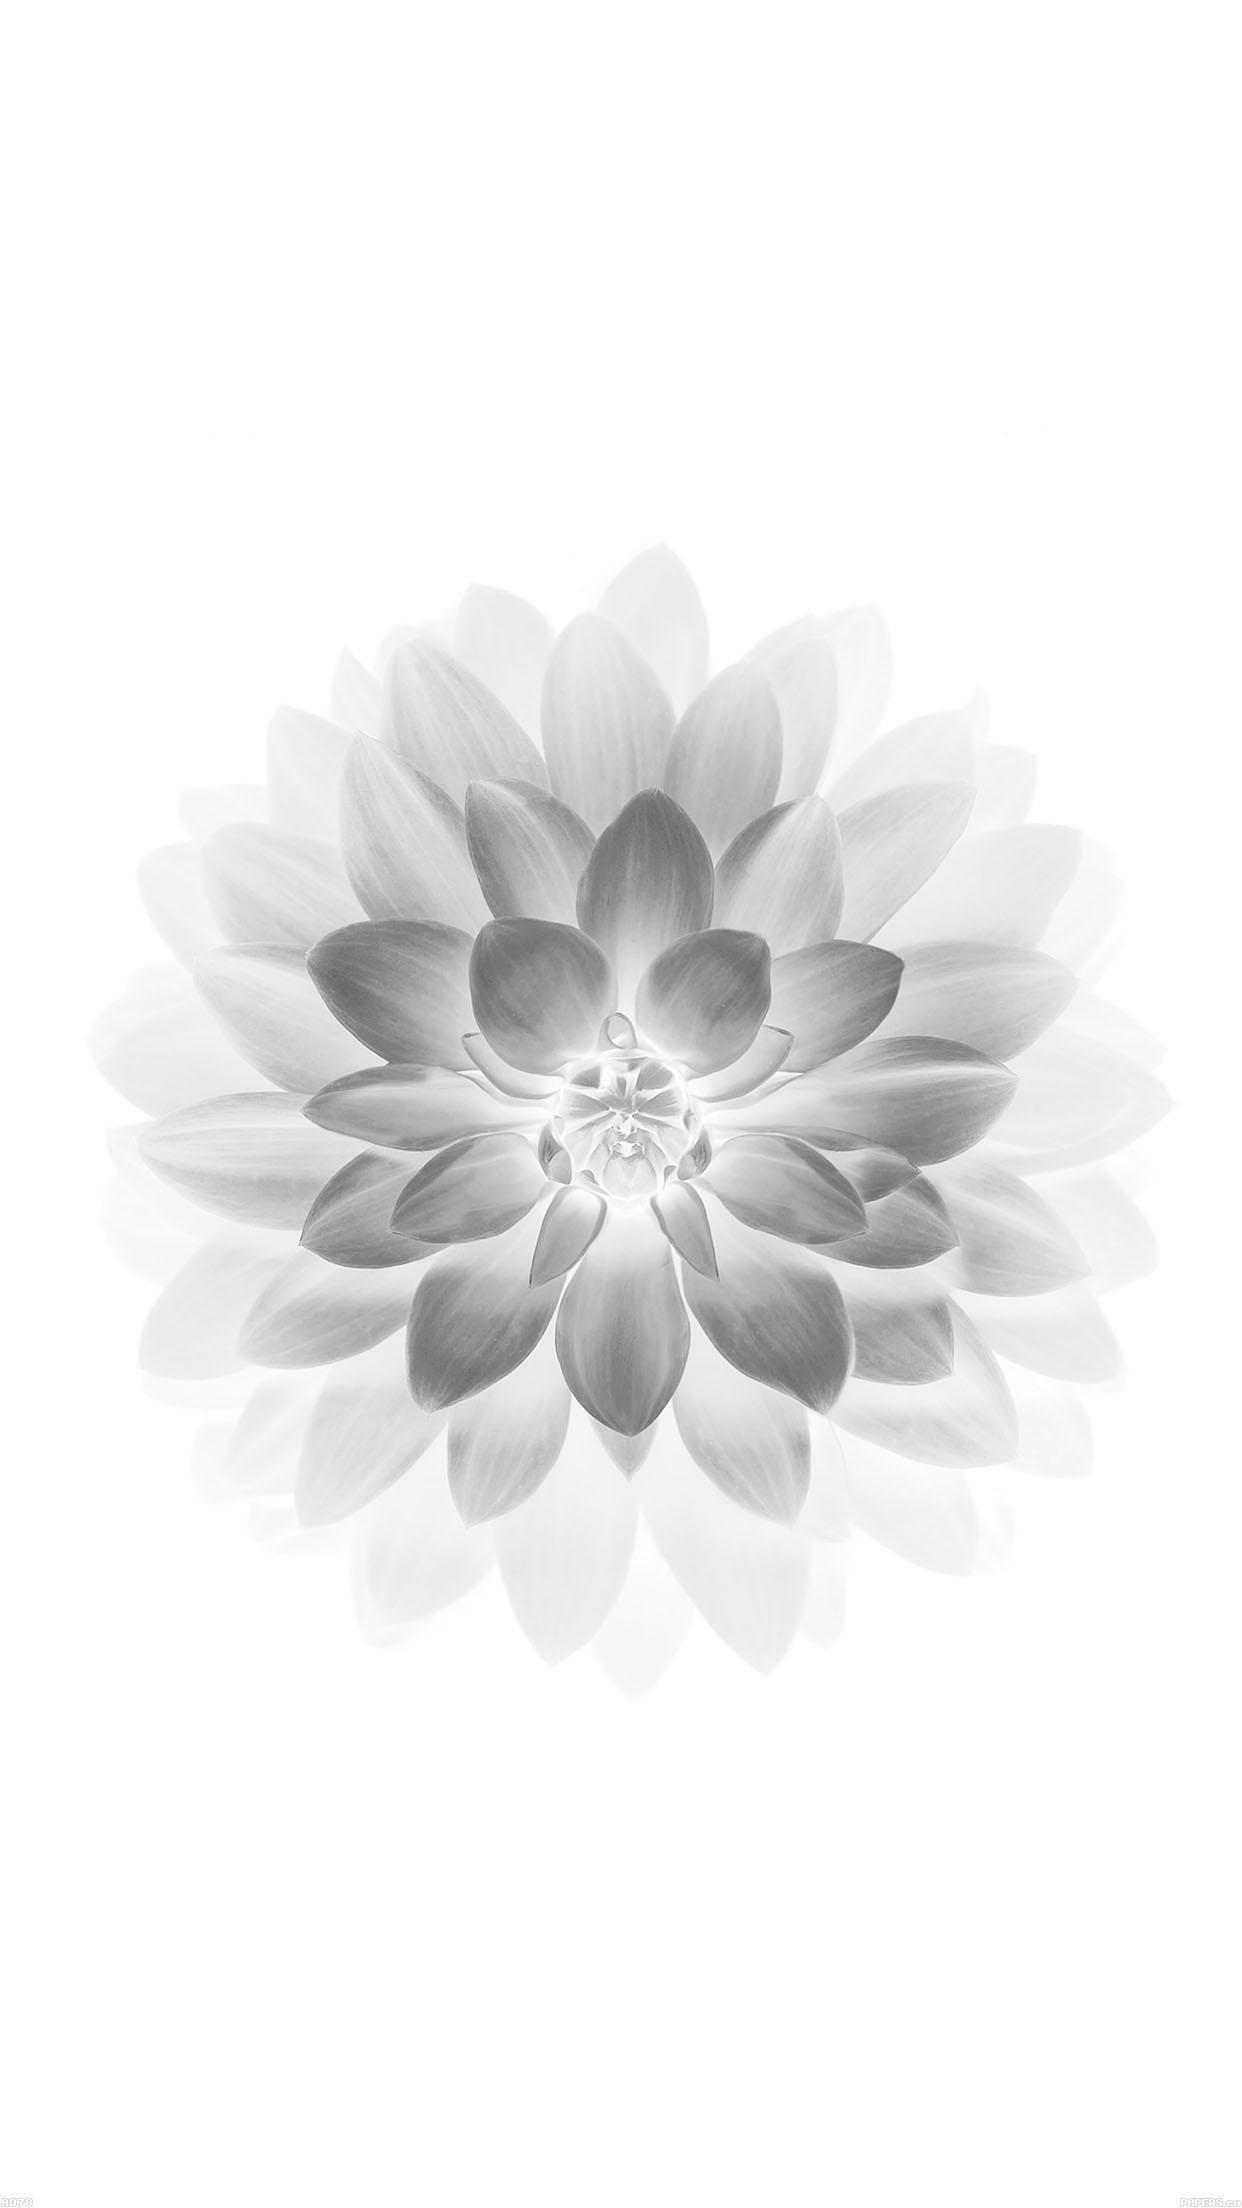 White wallpaper hd iphone 6 plus